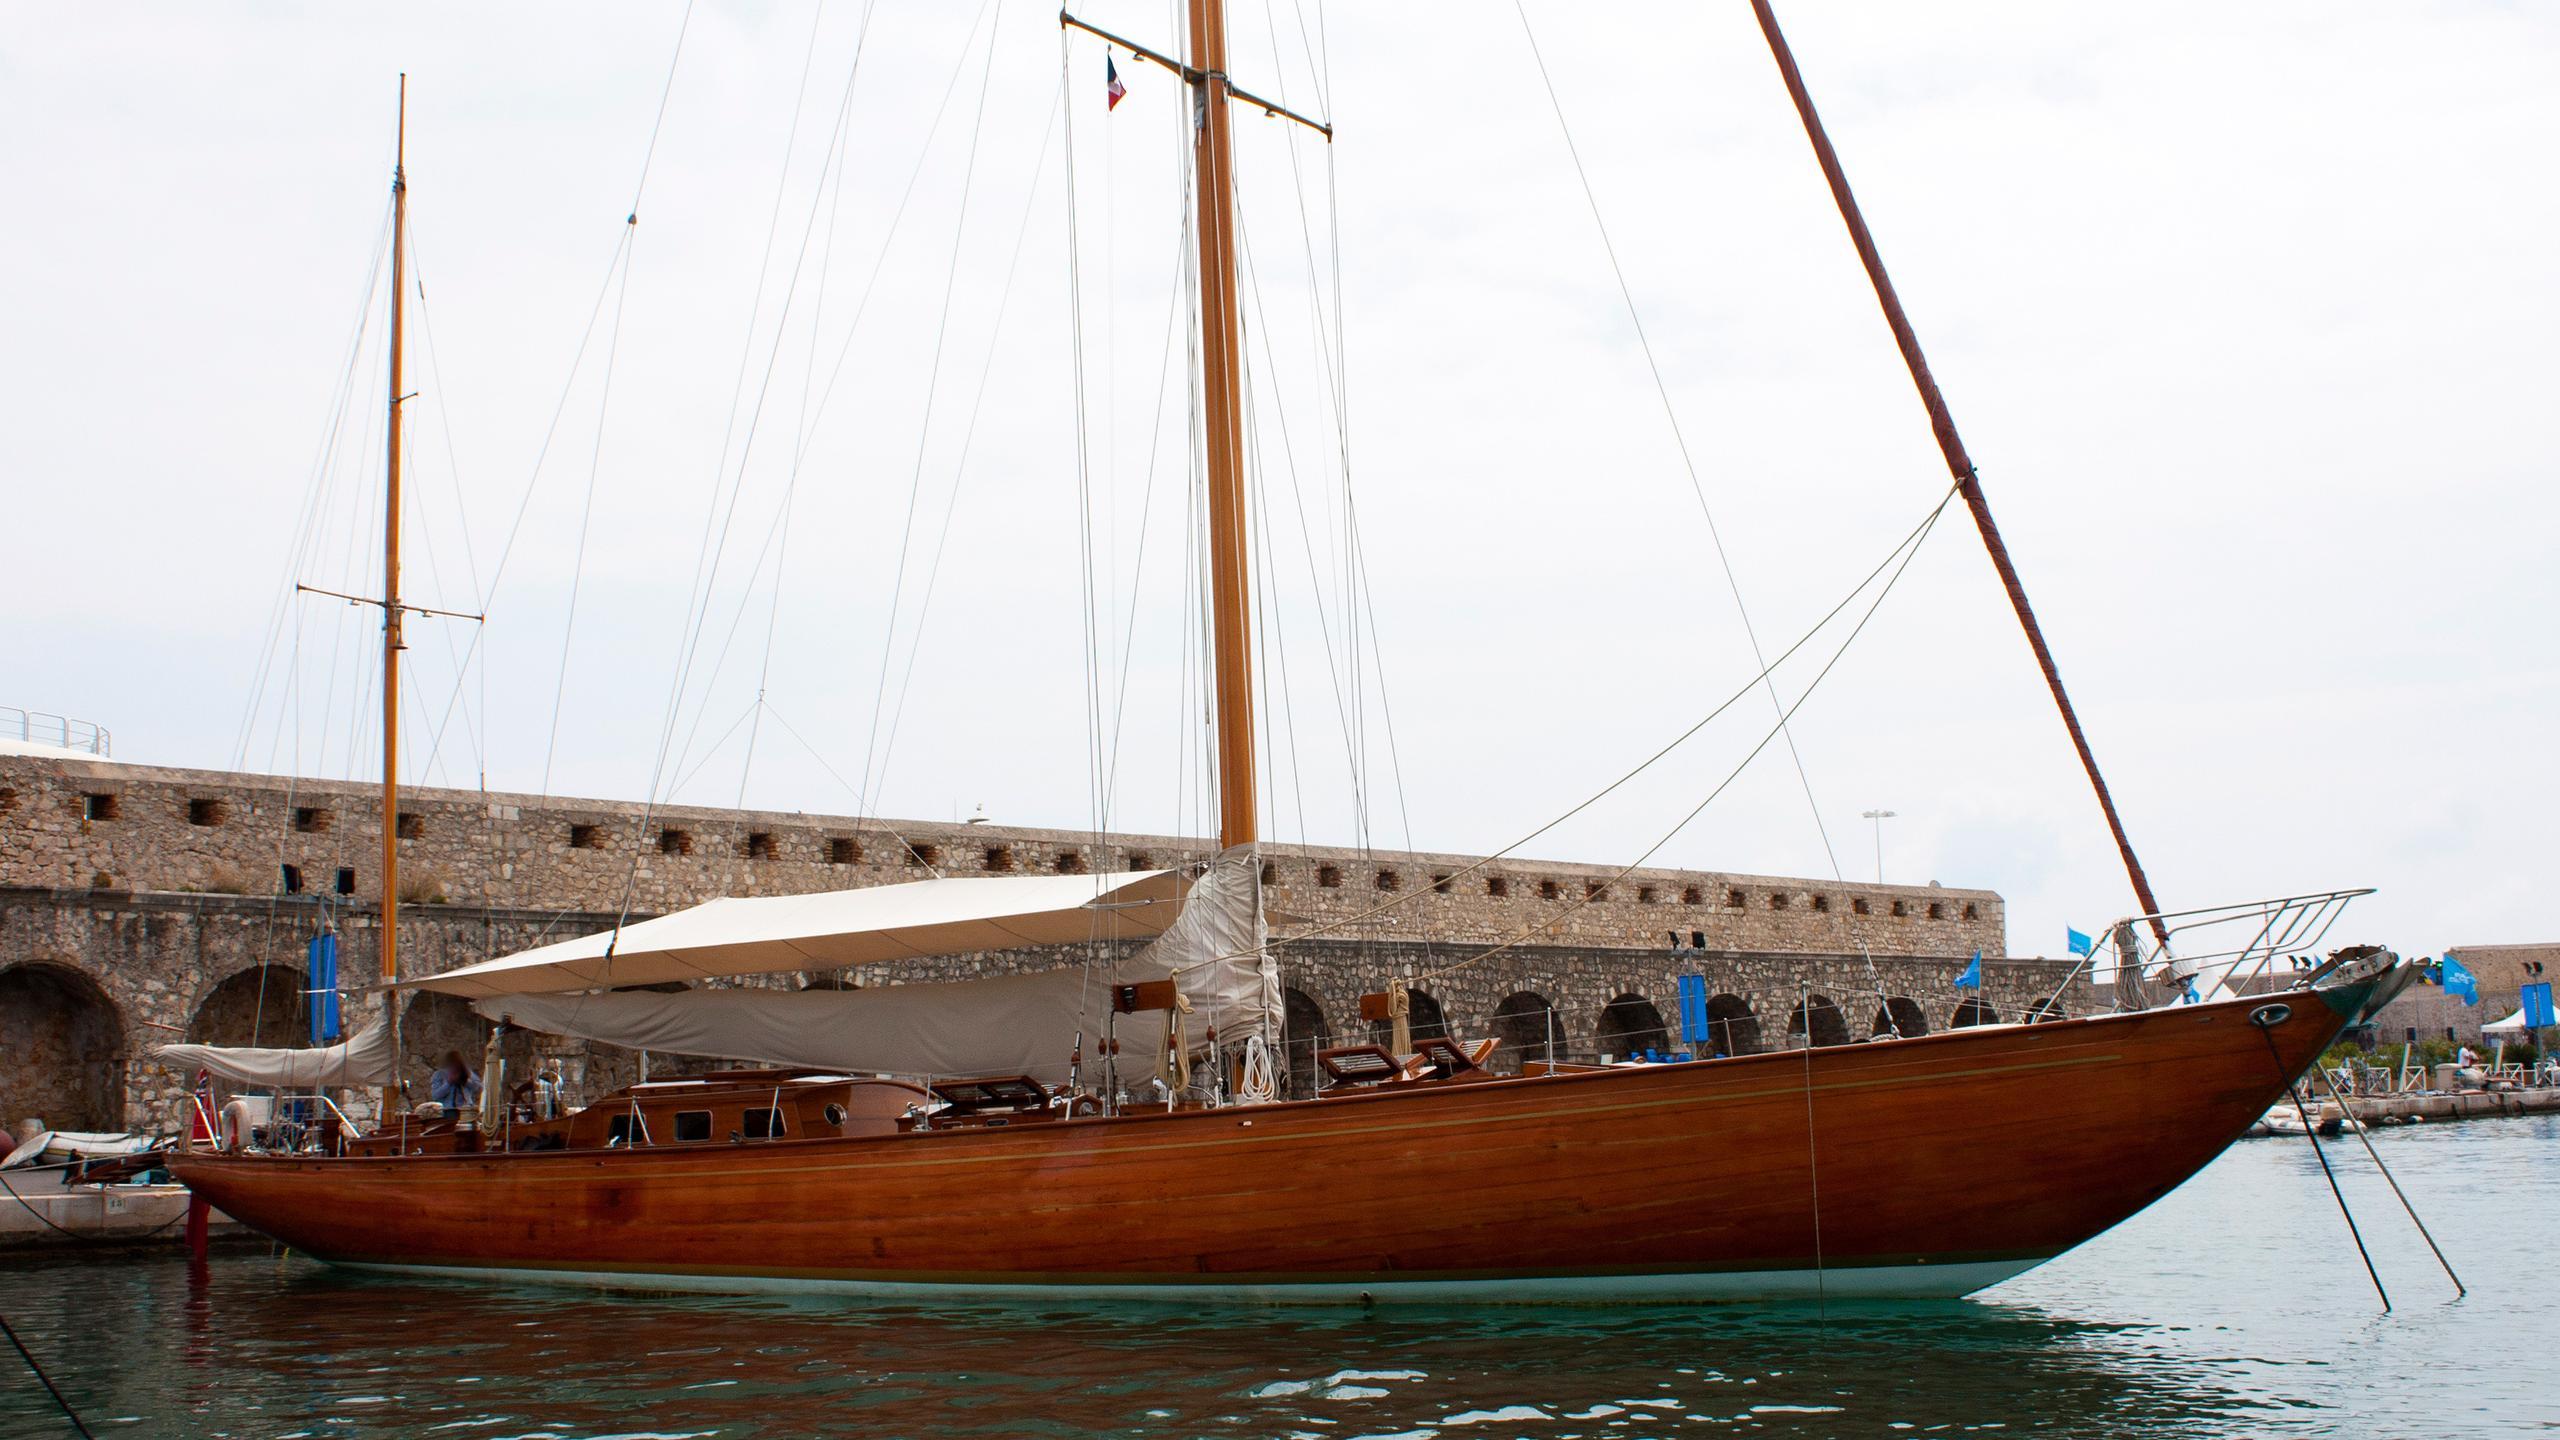 agneta-classic-sailing-yacht-plym-1951-25m-moored-half-profile